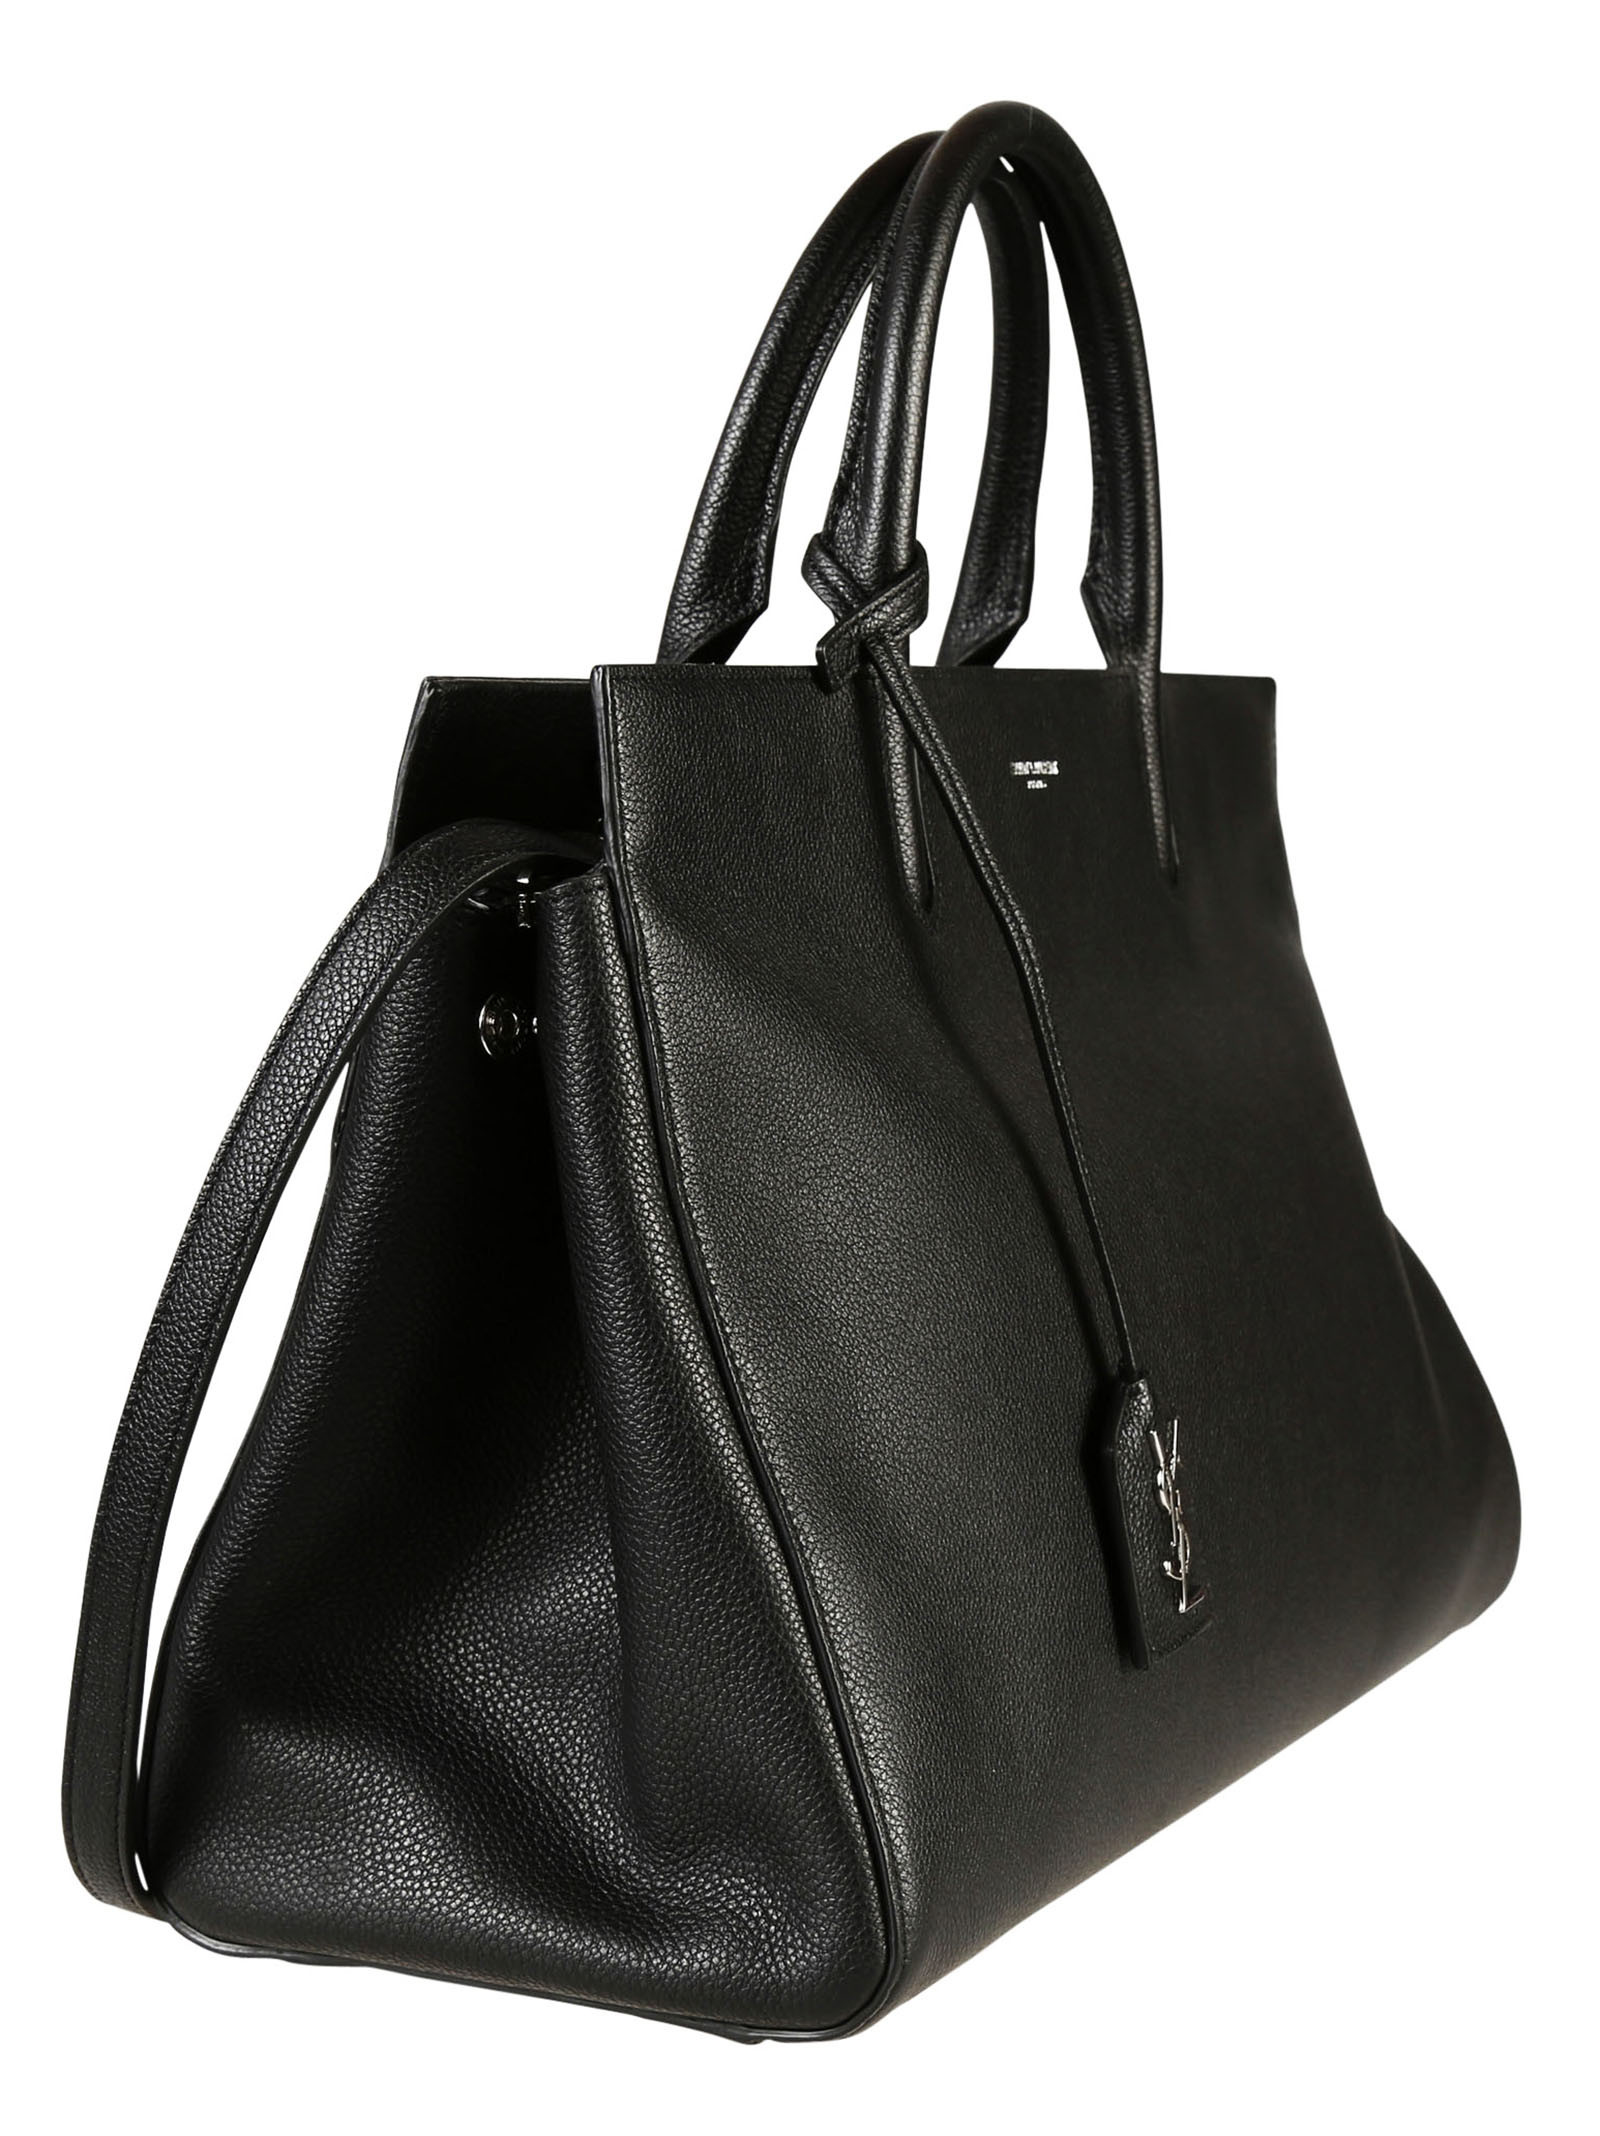 Cabas Rive Gauche Tote Bag, Dark Beige